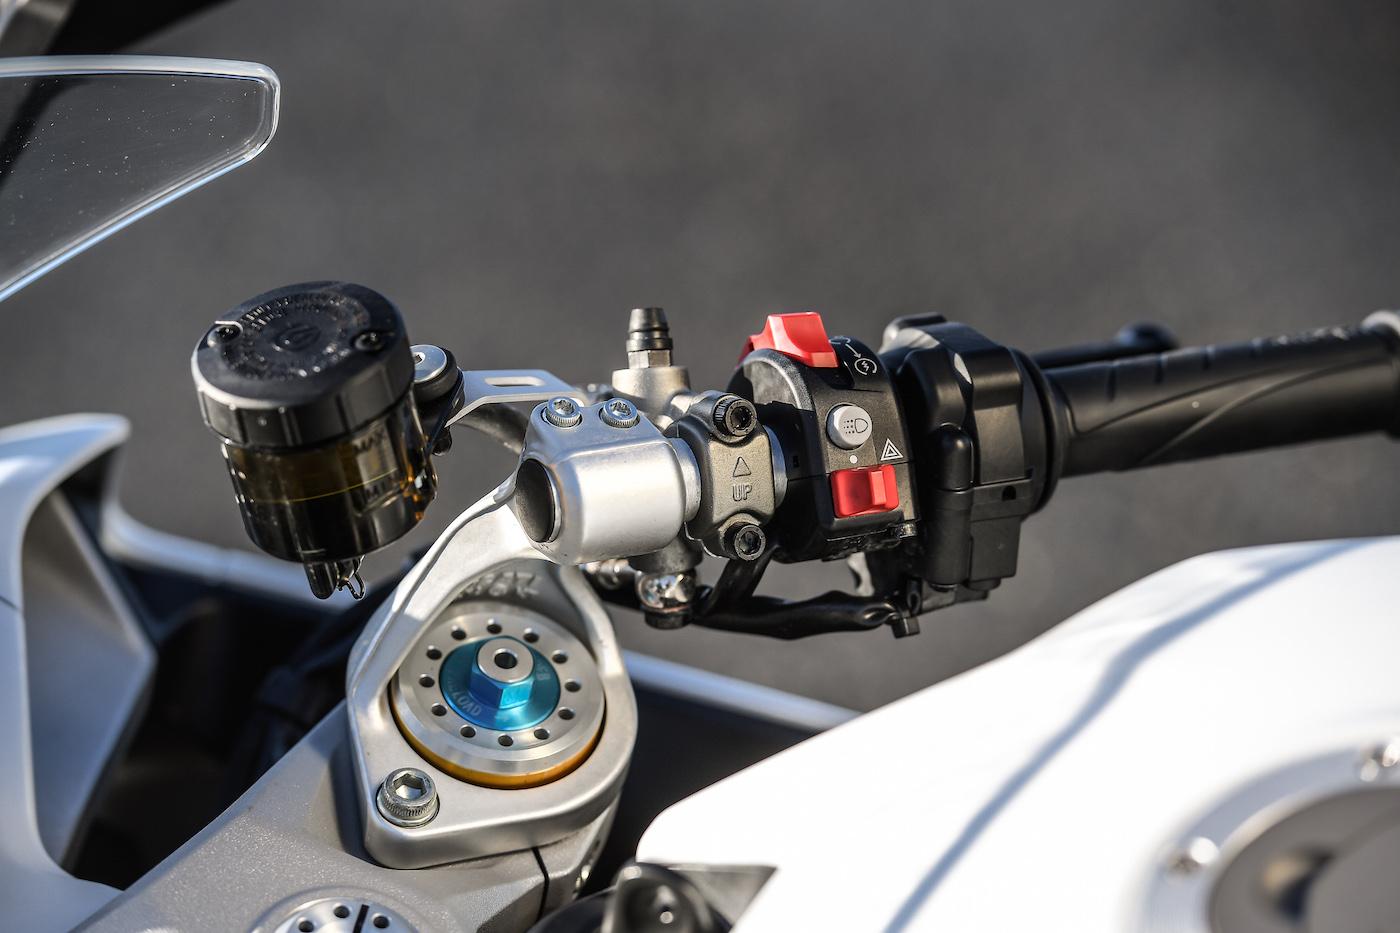 Ducati_Supersport_S_smalldet7